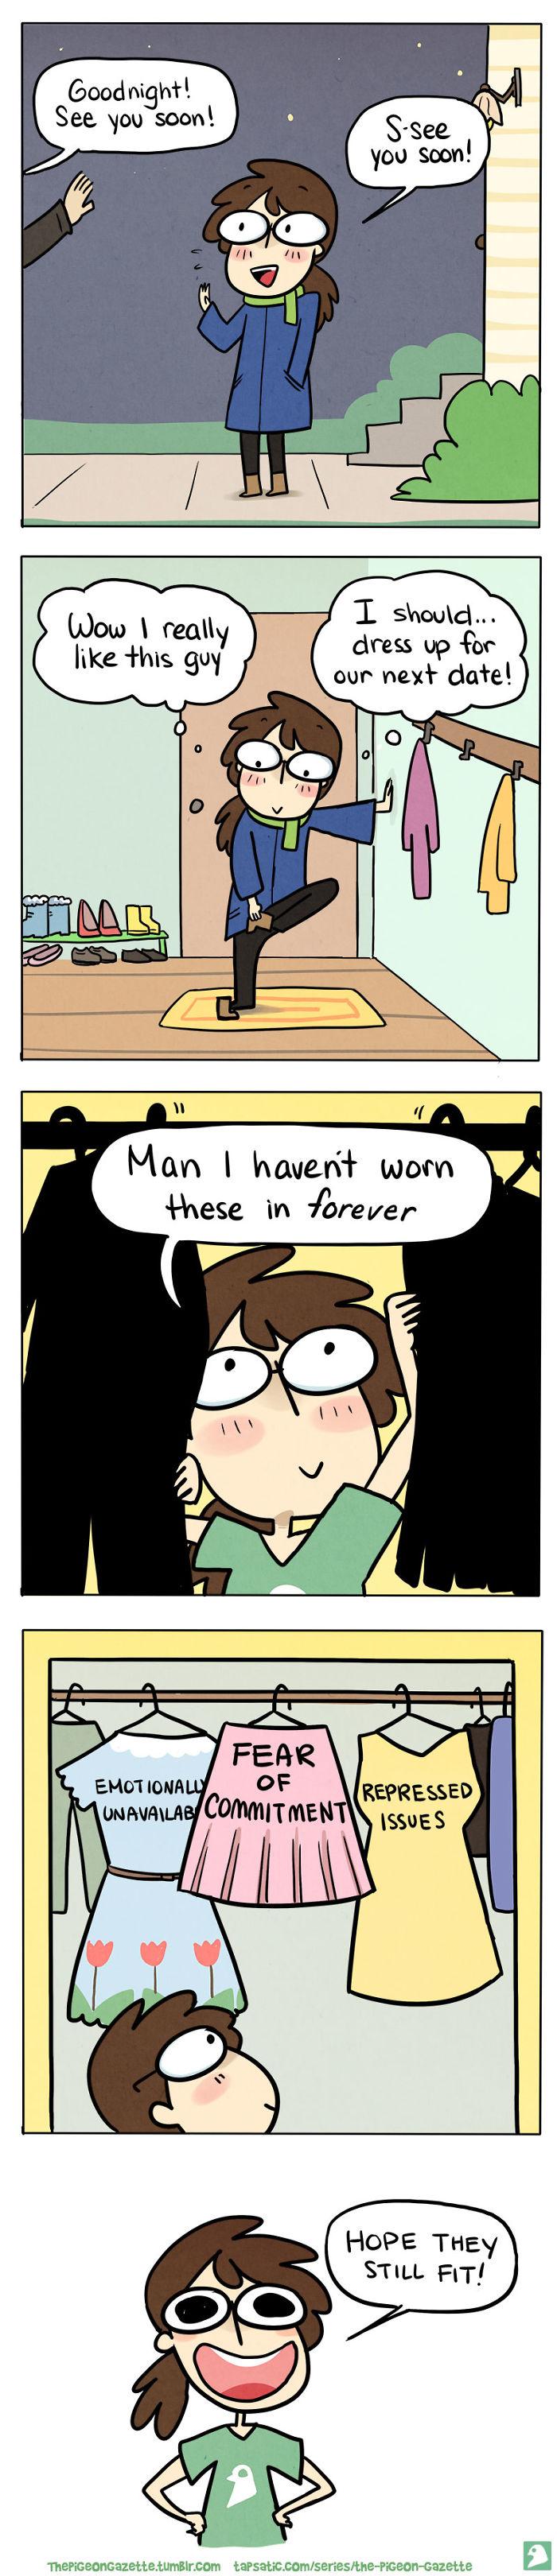 social awkwardness dating